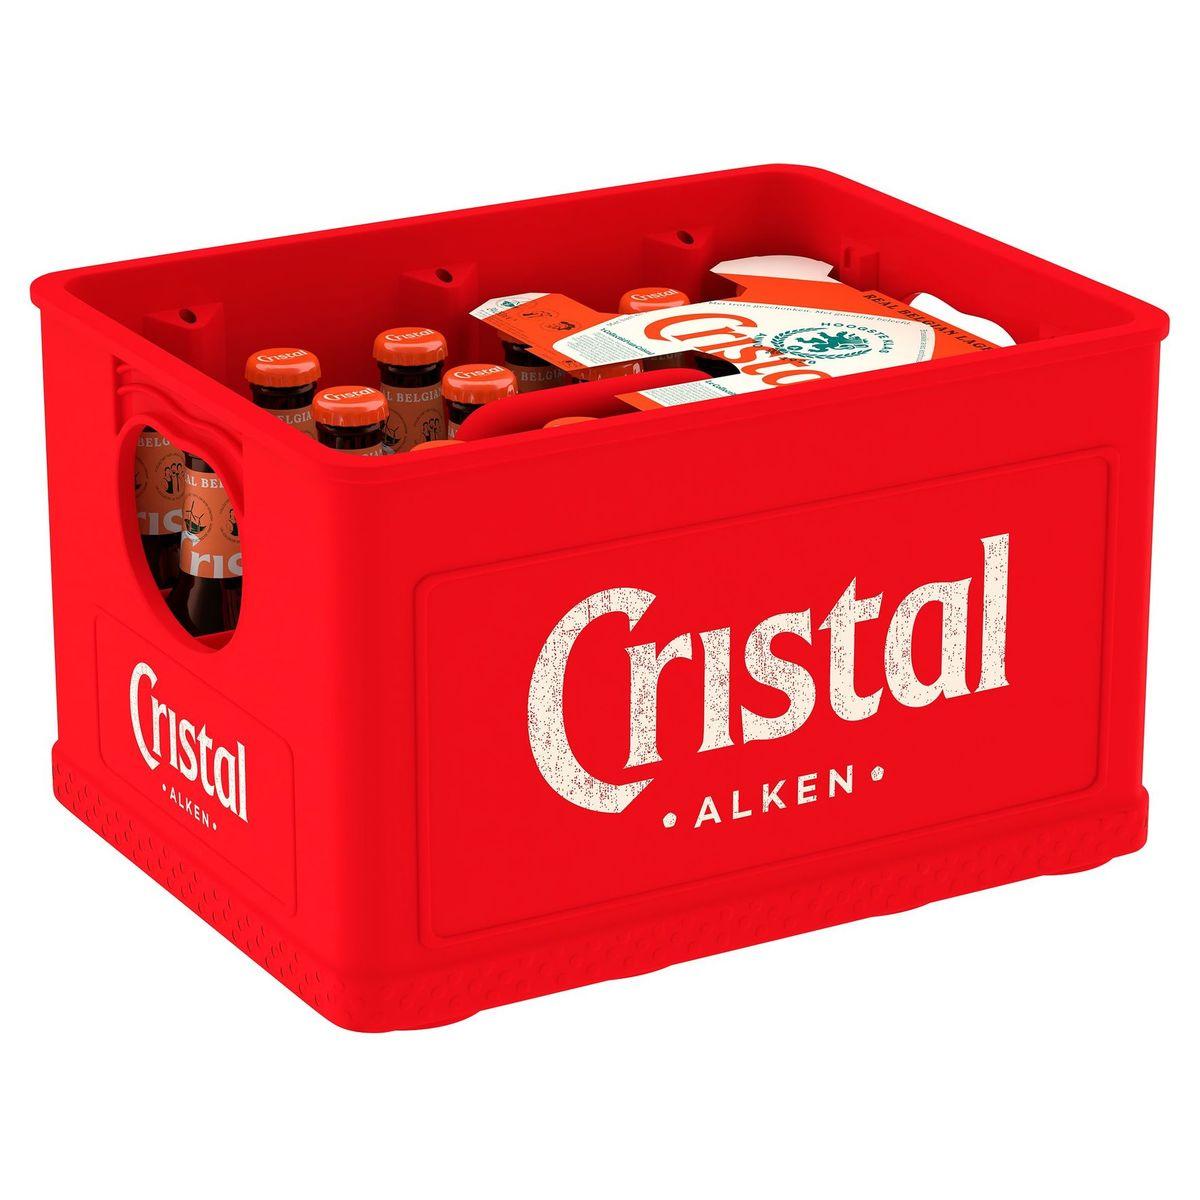 Crista Blond bier Pils 5%ALC 24x25cl bak